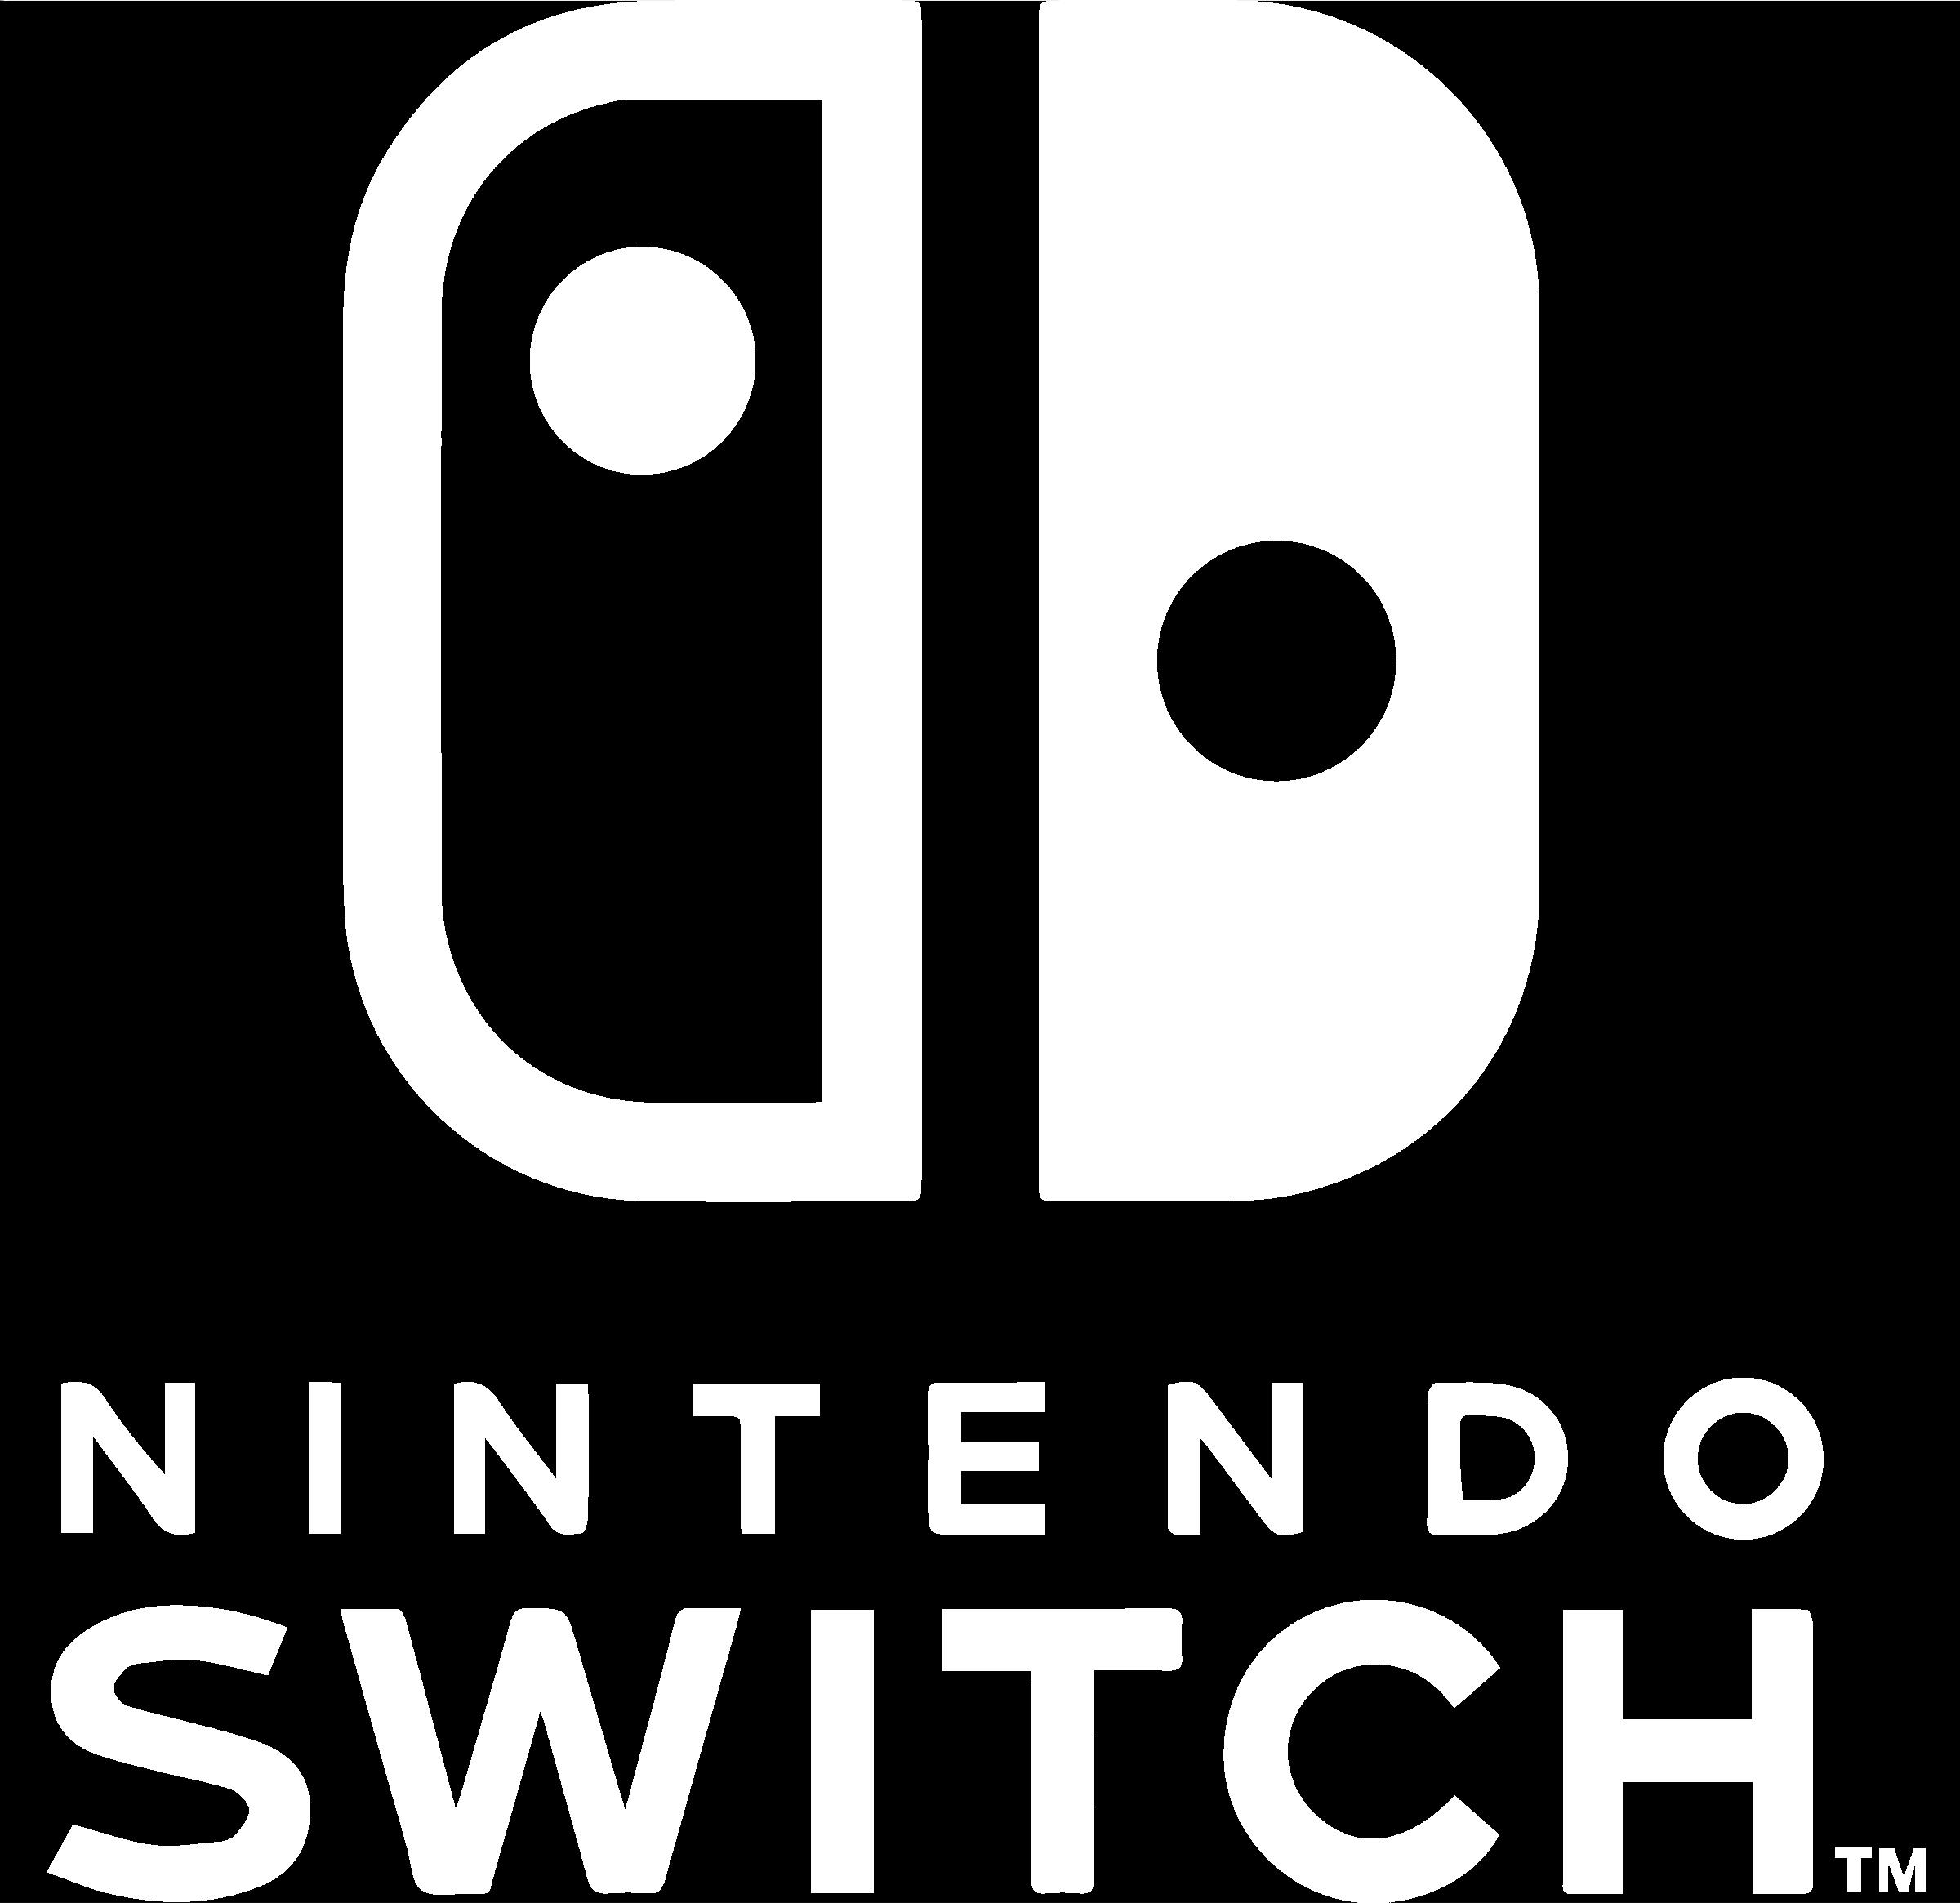 Nintendo Switch Logo PNG Transparent & SVG Vector.